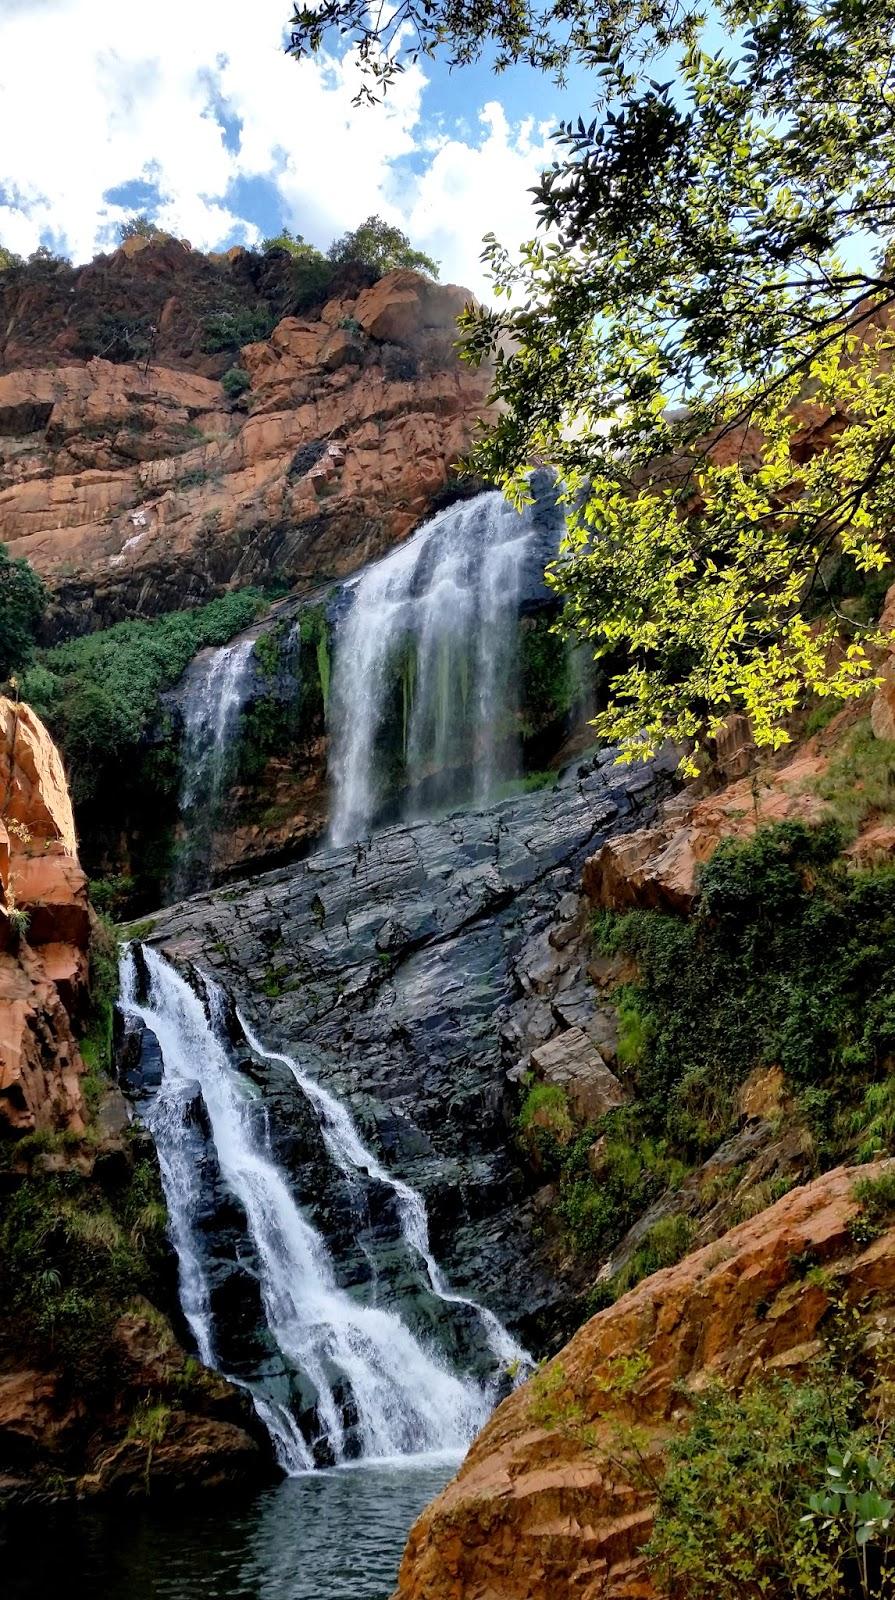 Walter Sisulu Botanical Gardens Waterfall